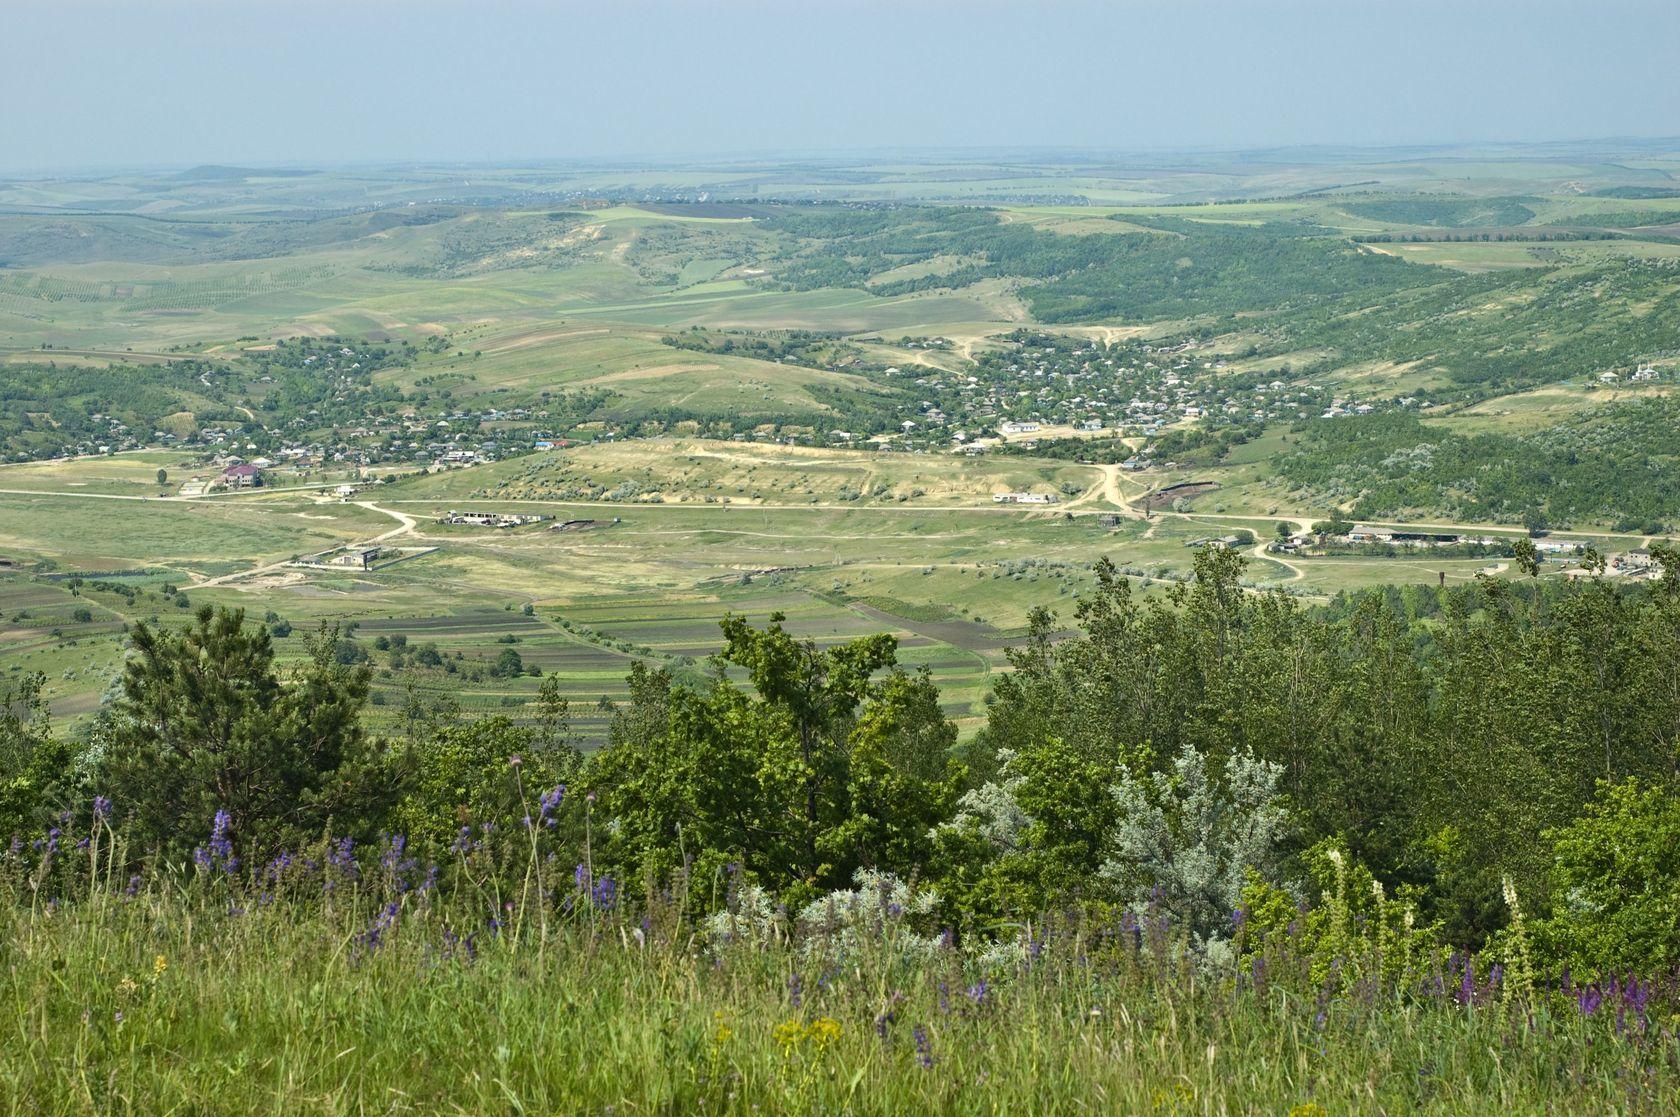 Venkovská krajina v Moldavsku | starush/123RF.com